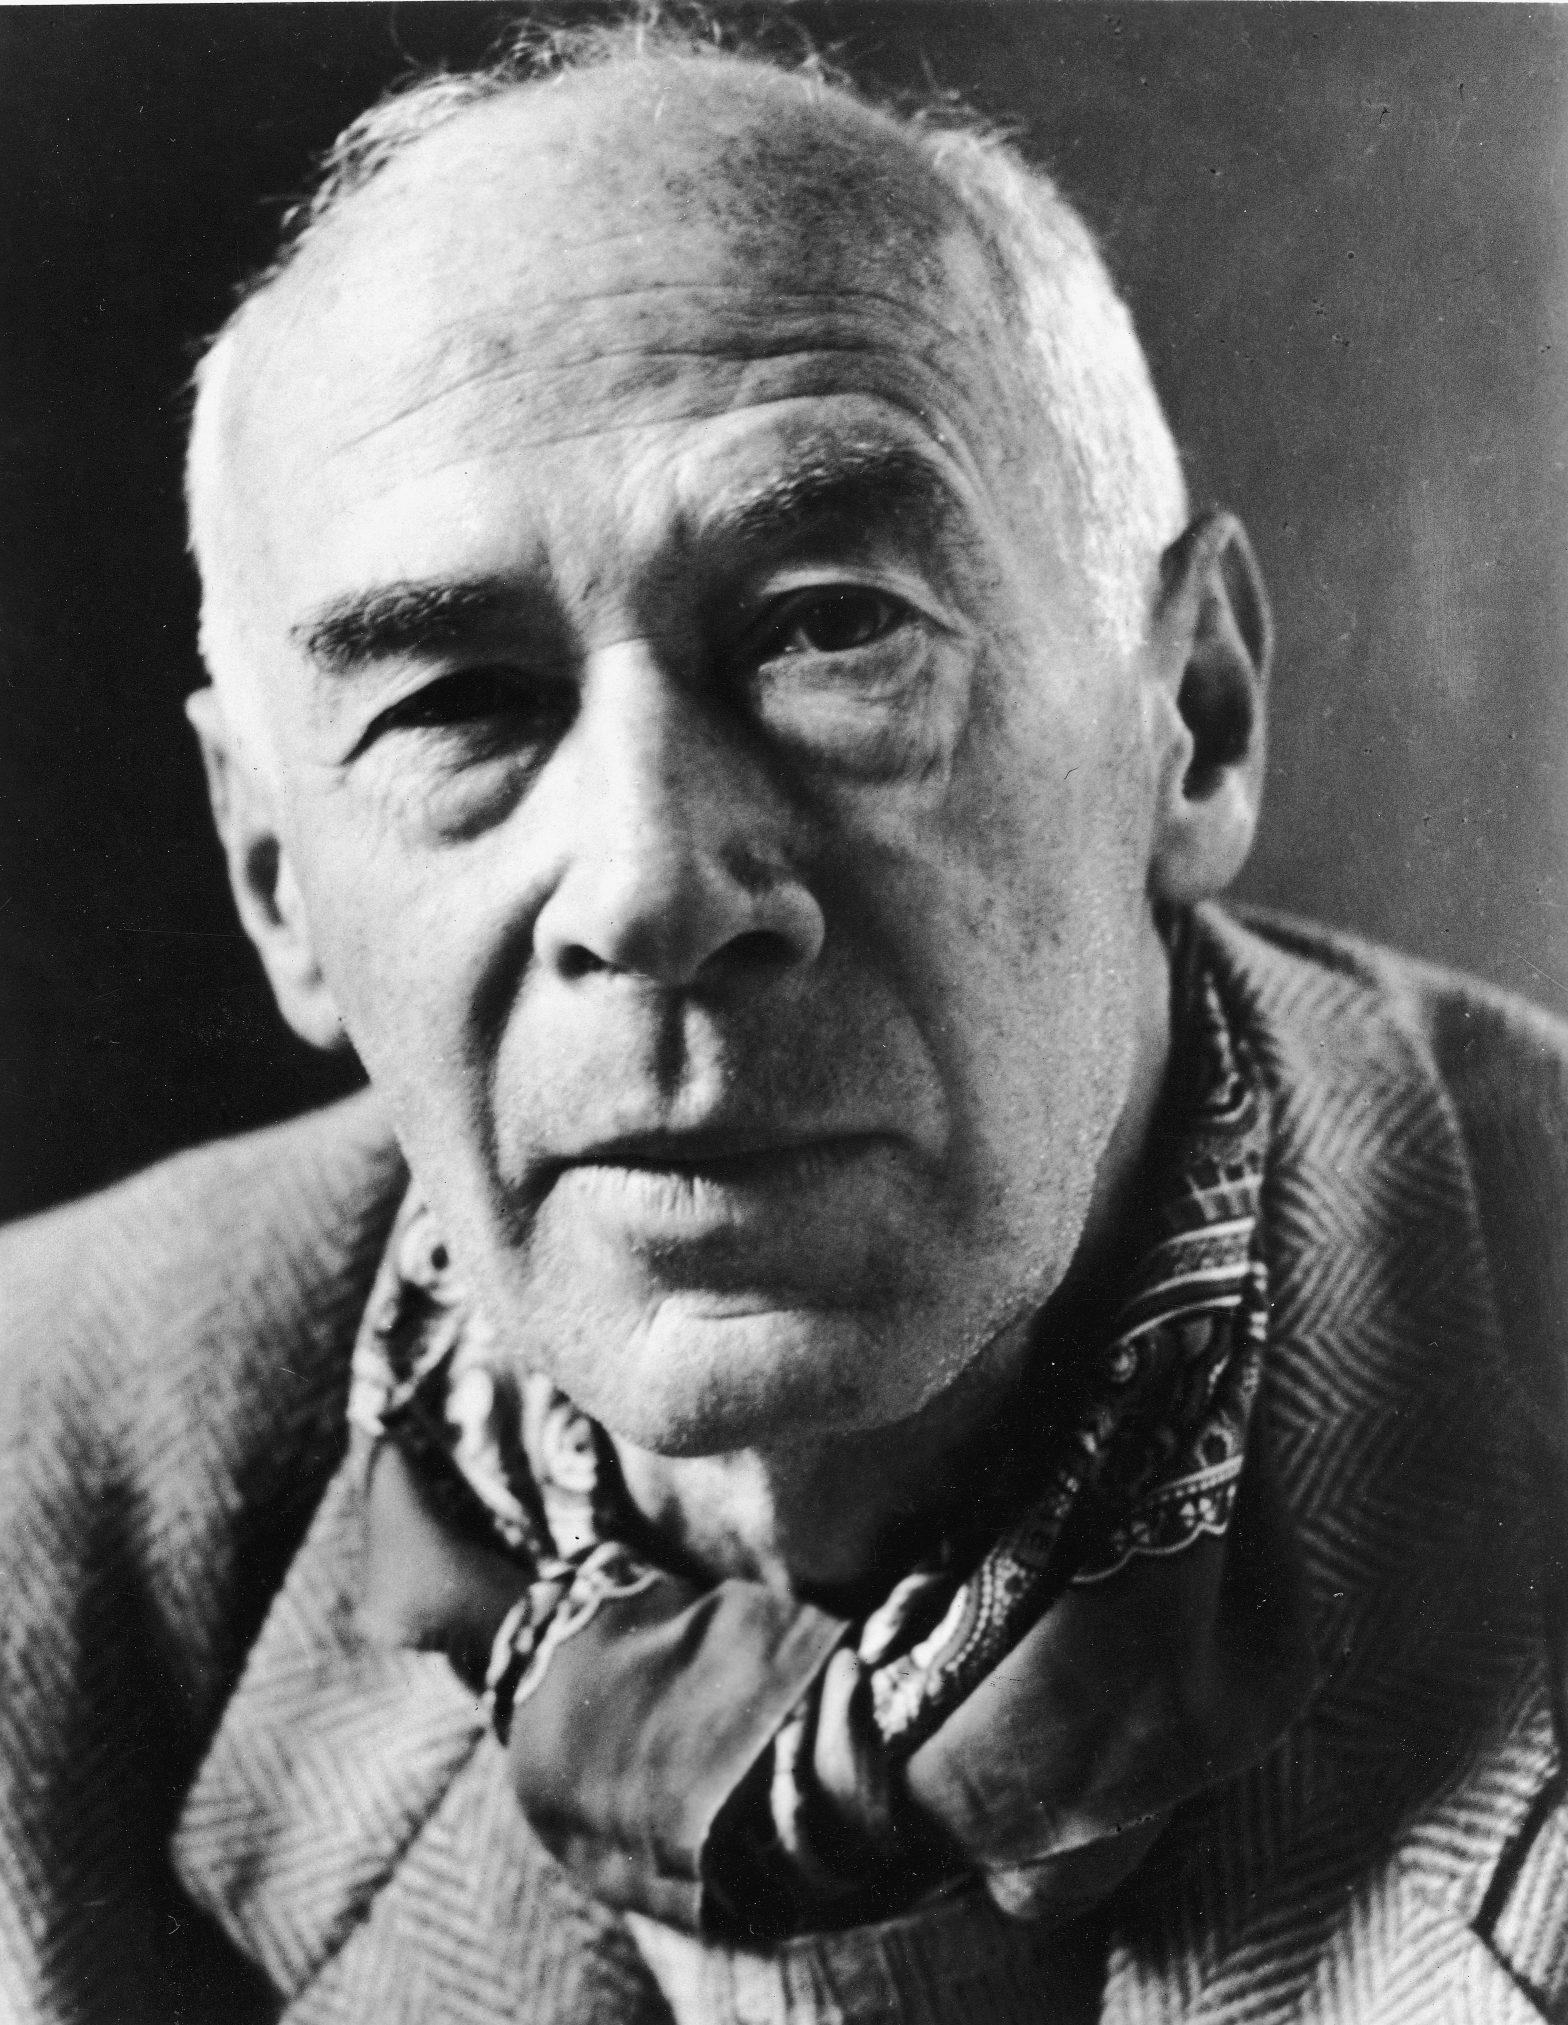 Portrait of Author Henry Miller